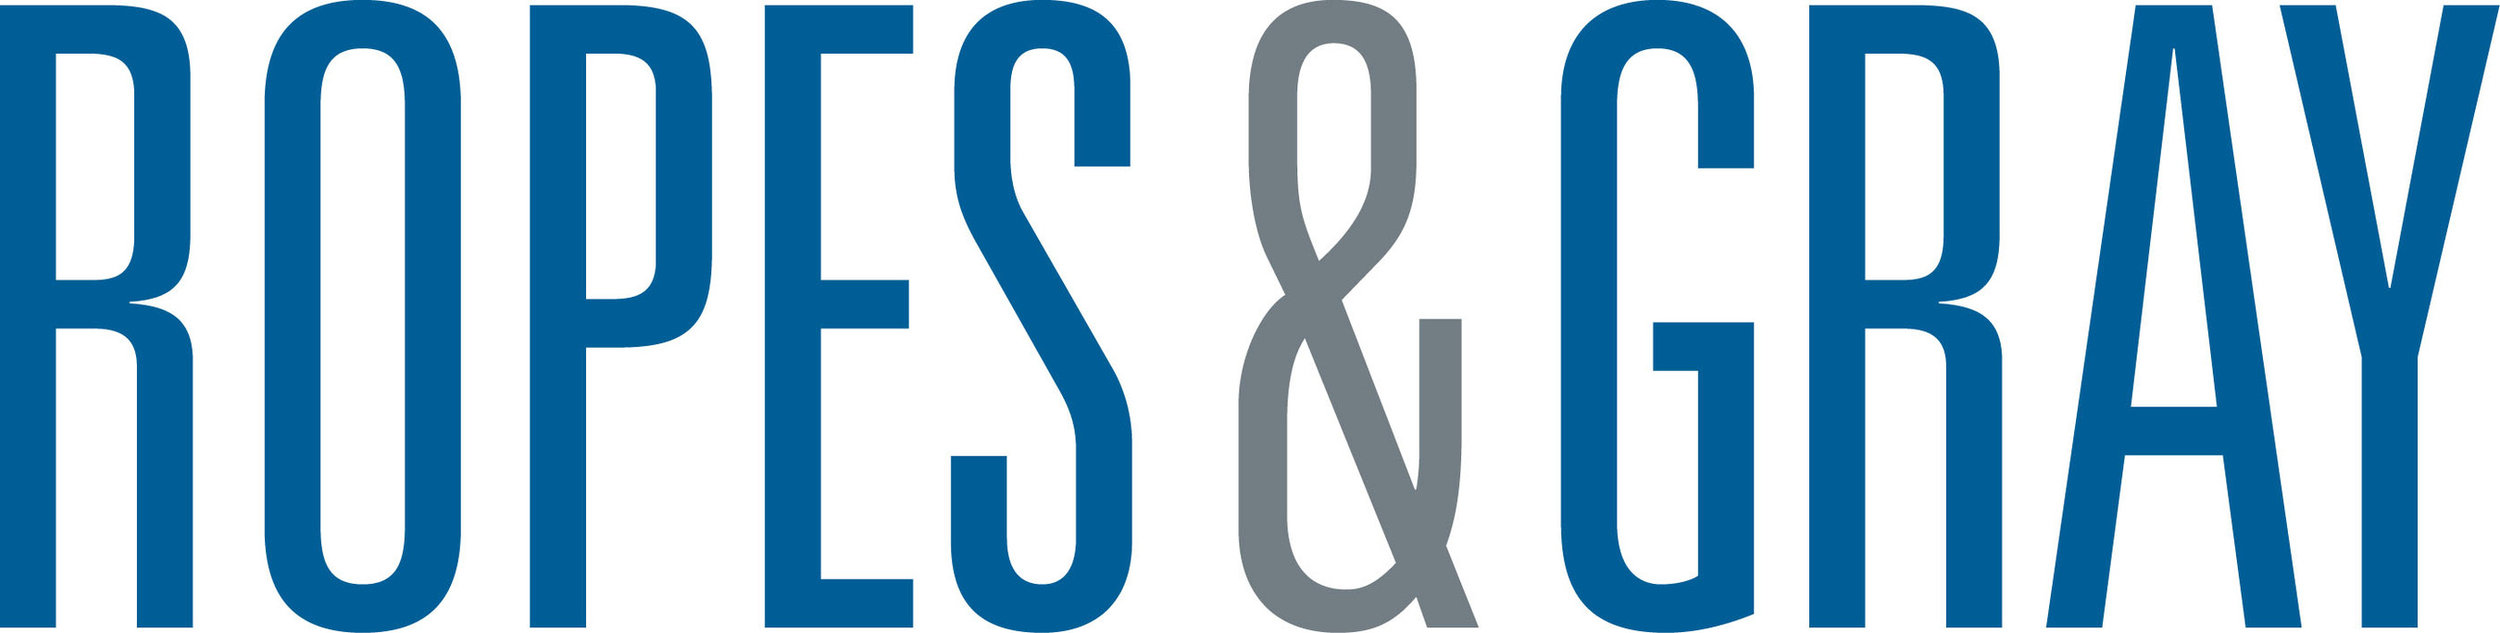 Ropes & Gray Logo High Res.jpg